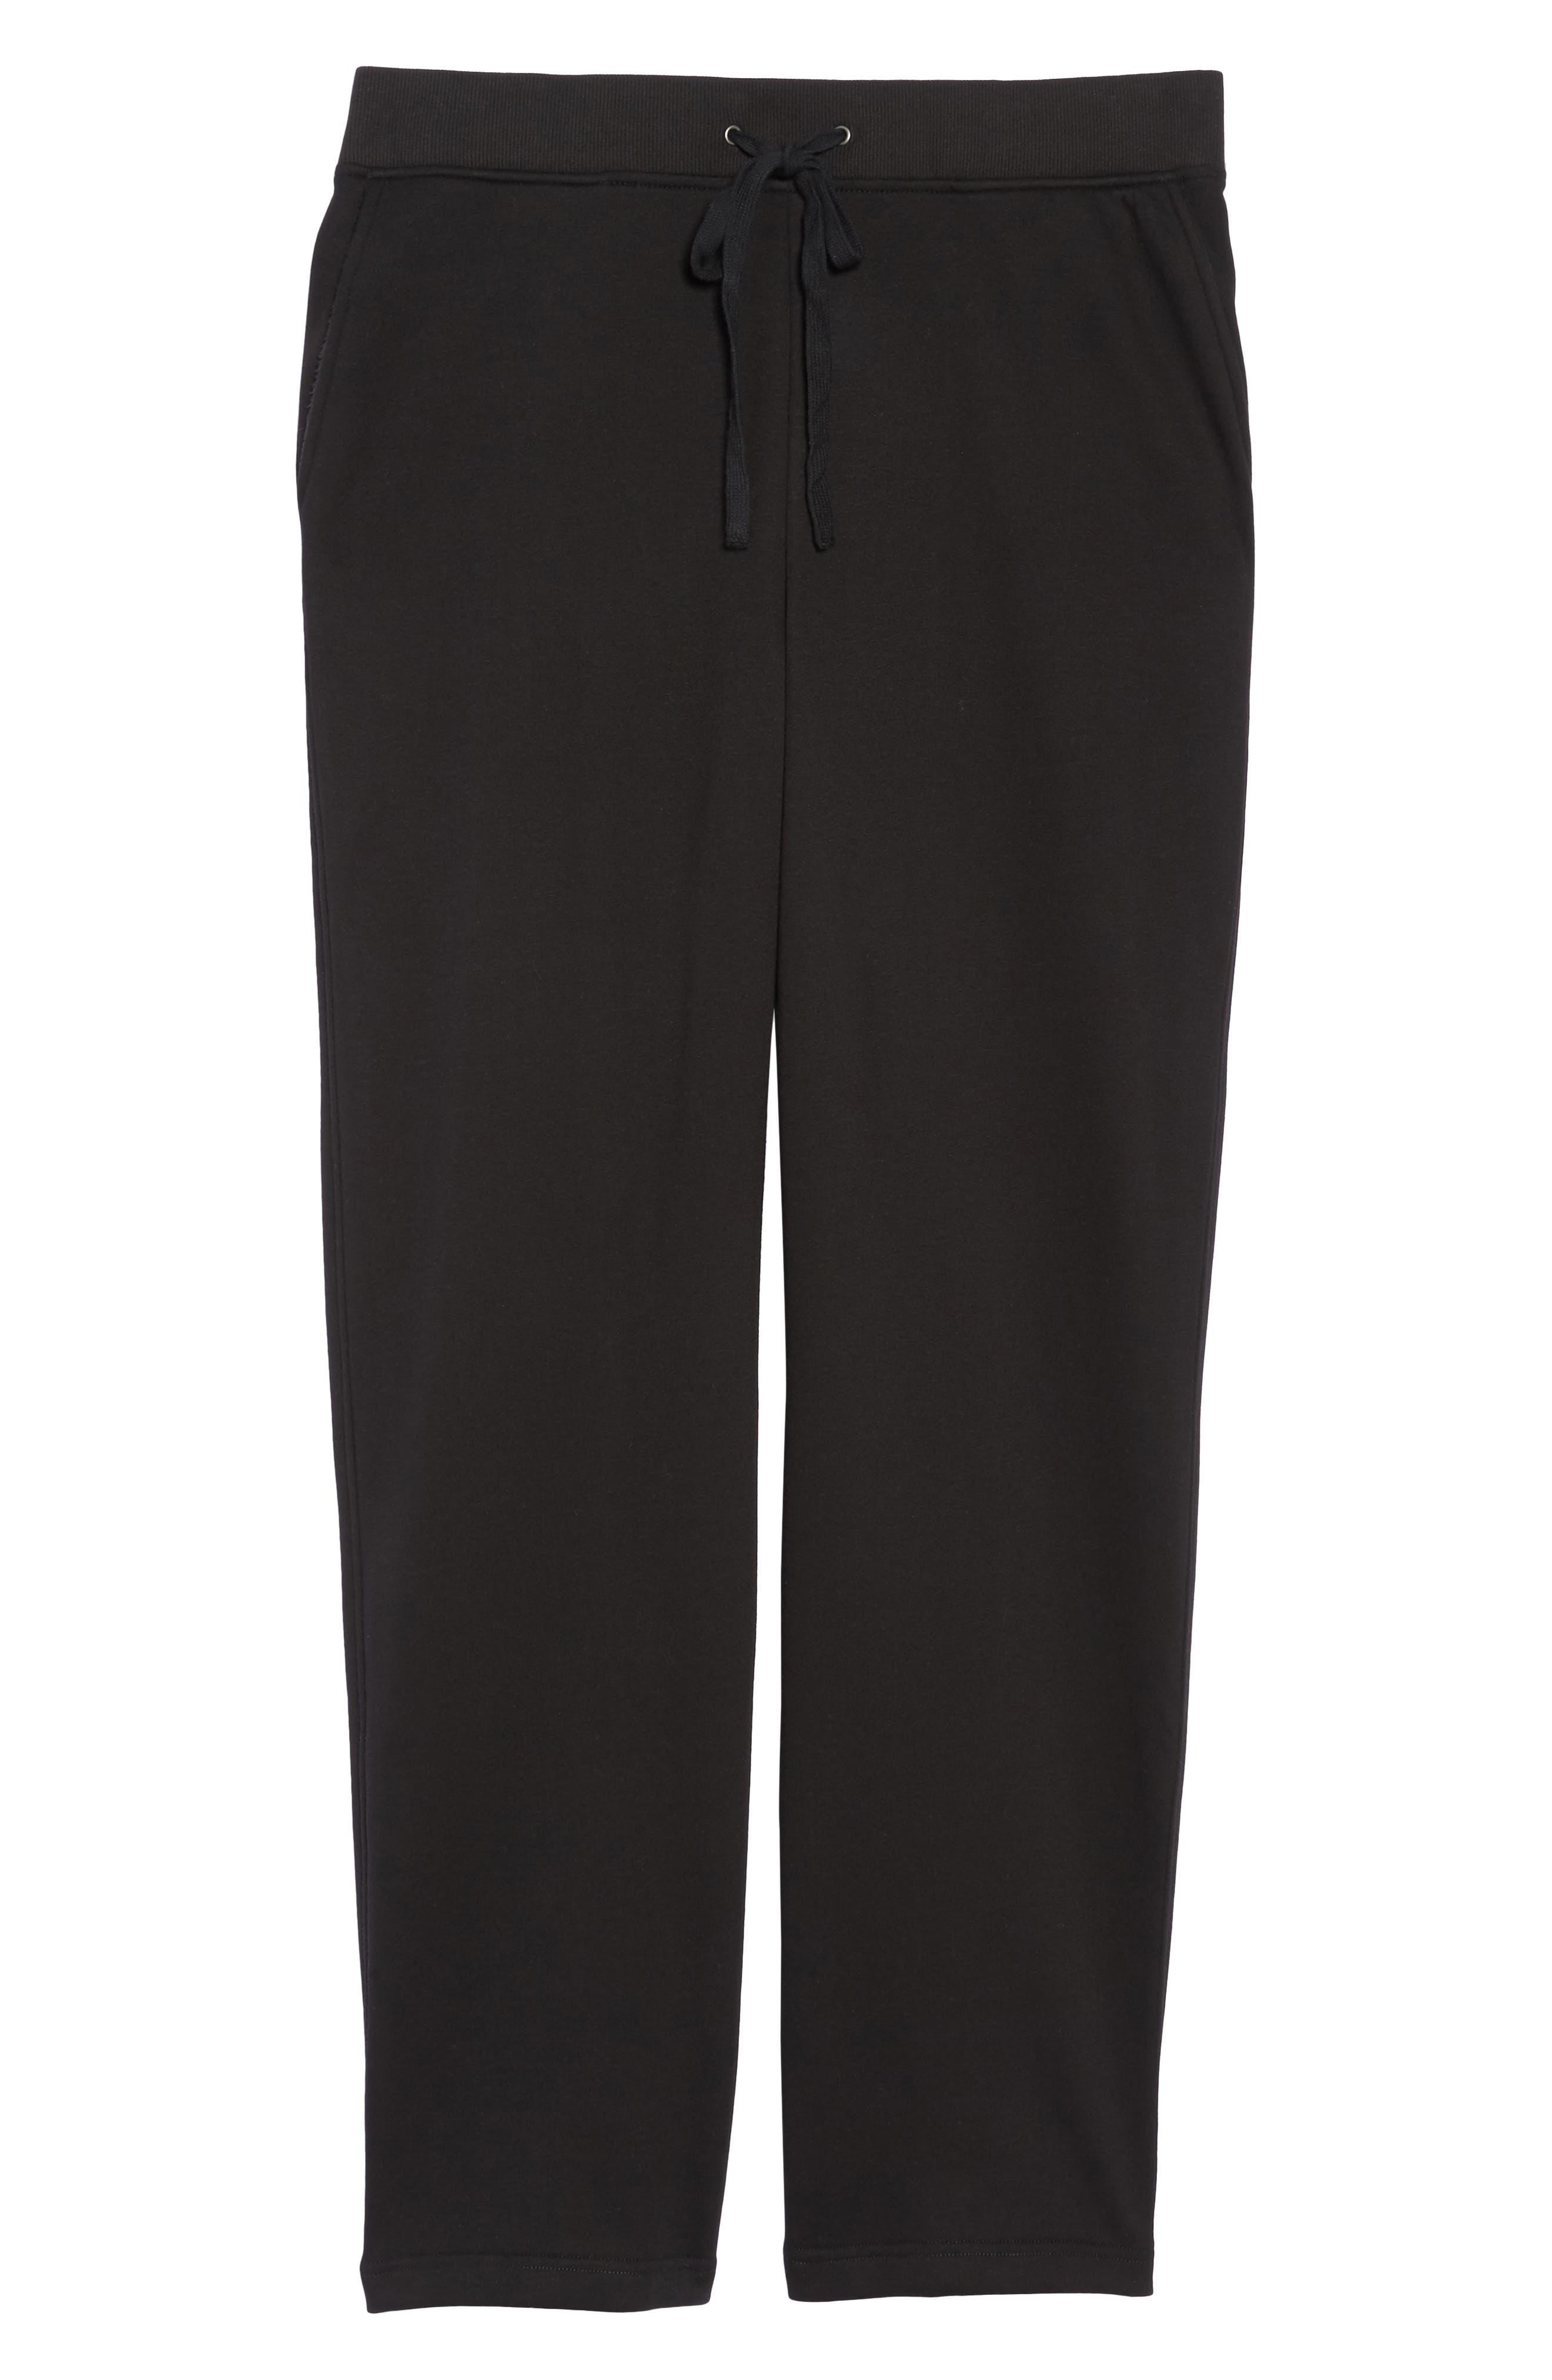 Penny Fleece Sweatpants,                             Alternate thumbnail 6, color,                             BLACK